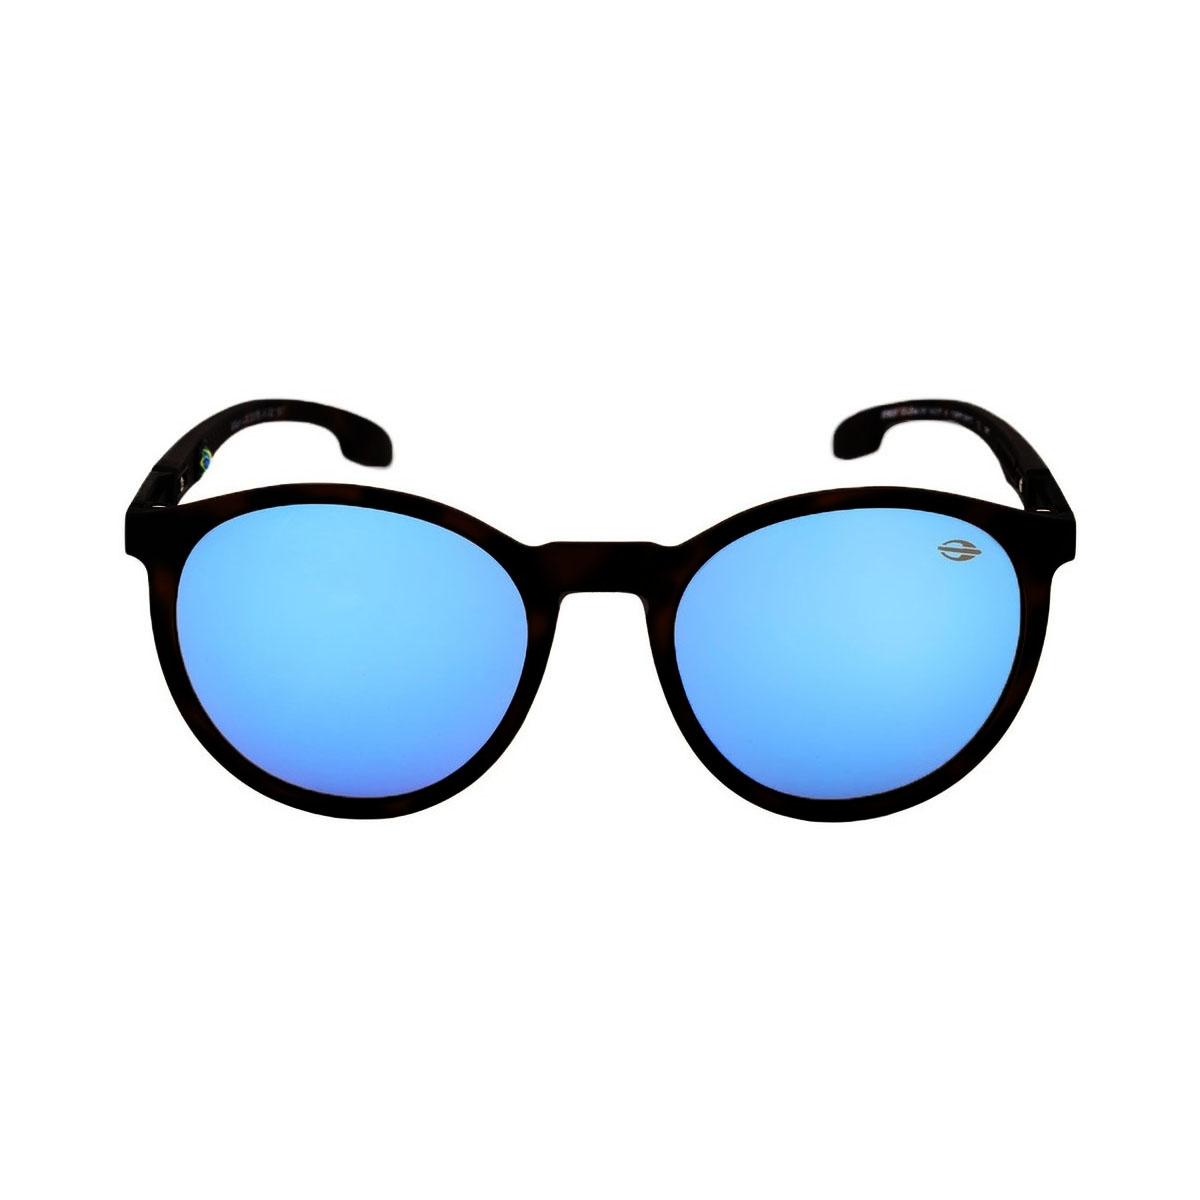 ccfb3af089114 óculos De Sol Mormaii Monterey Preto Fosco Com Azul   CINEMAS 93